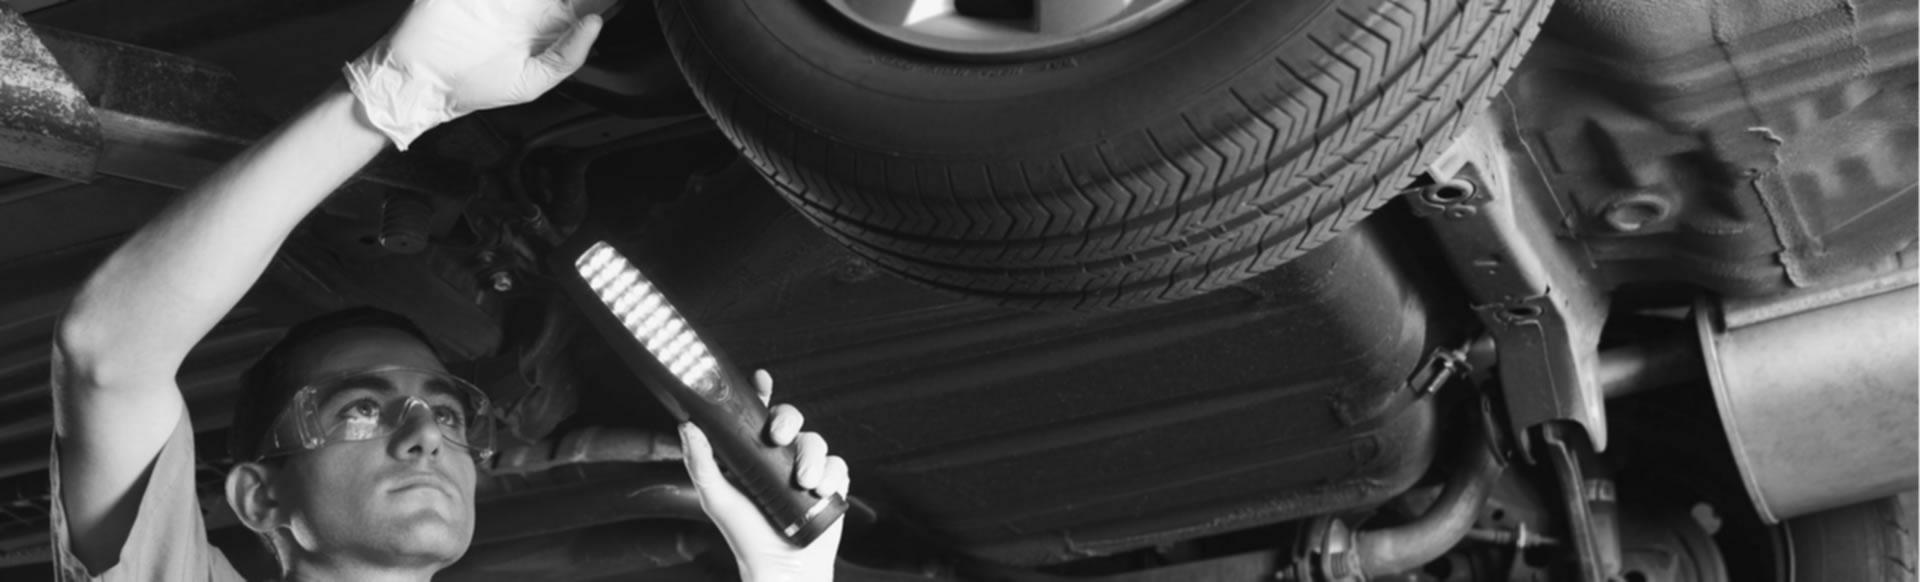 car service in las vegas